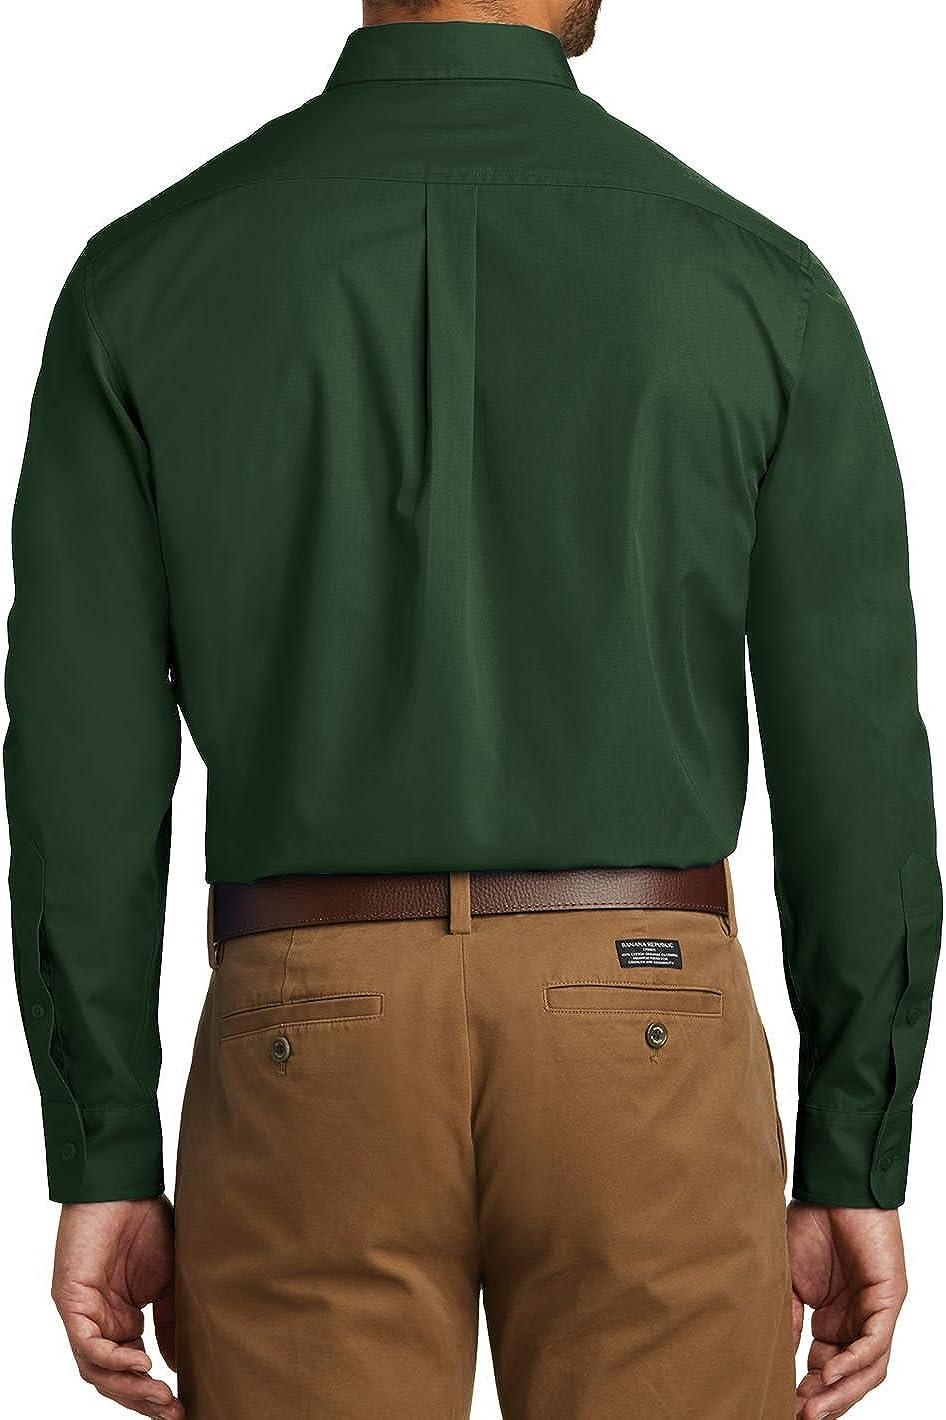 Men's Long Sleeve Professional Uniform Carefree Poplin Shirt